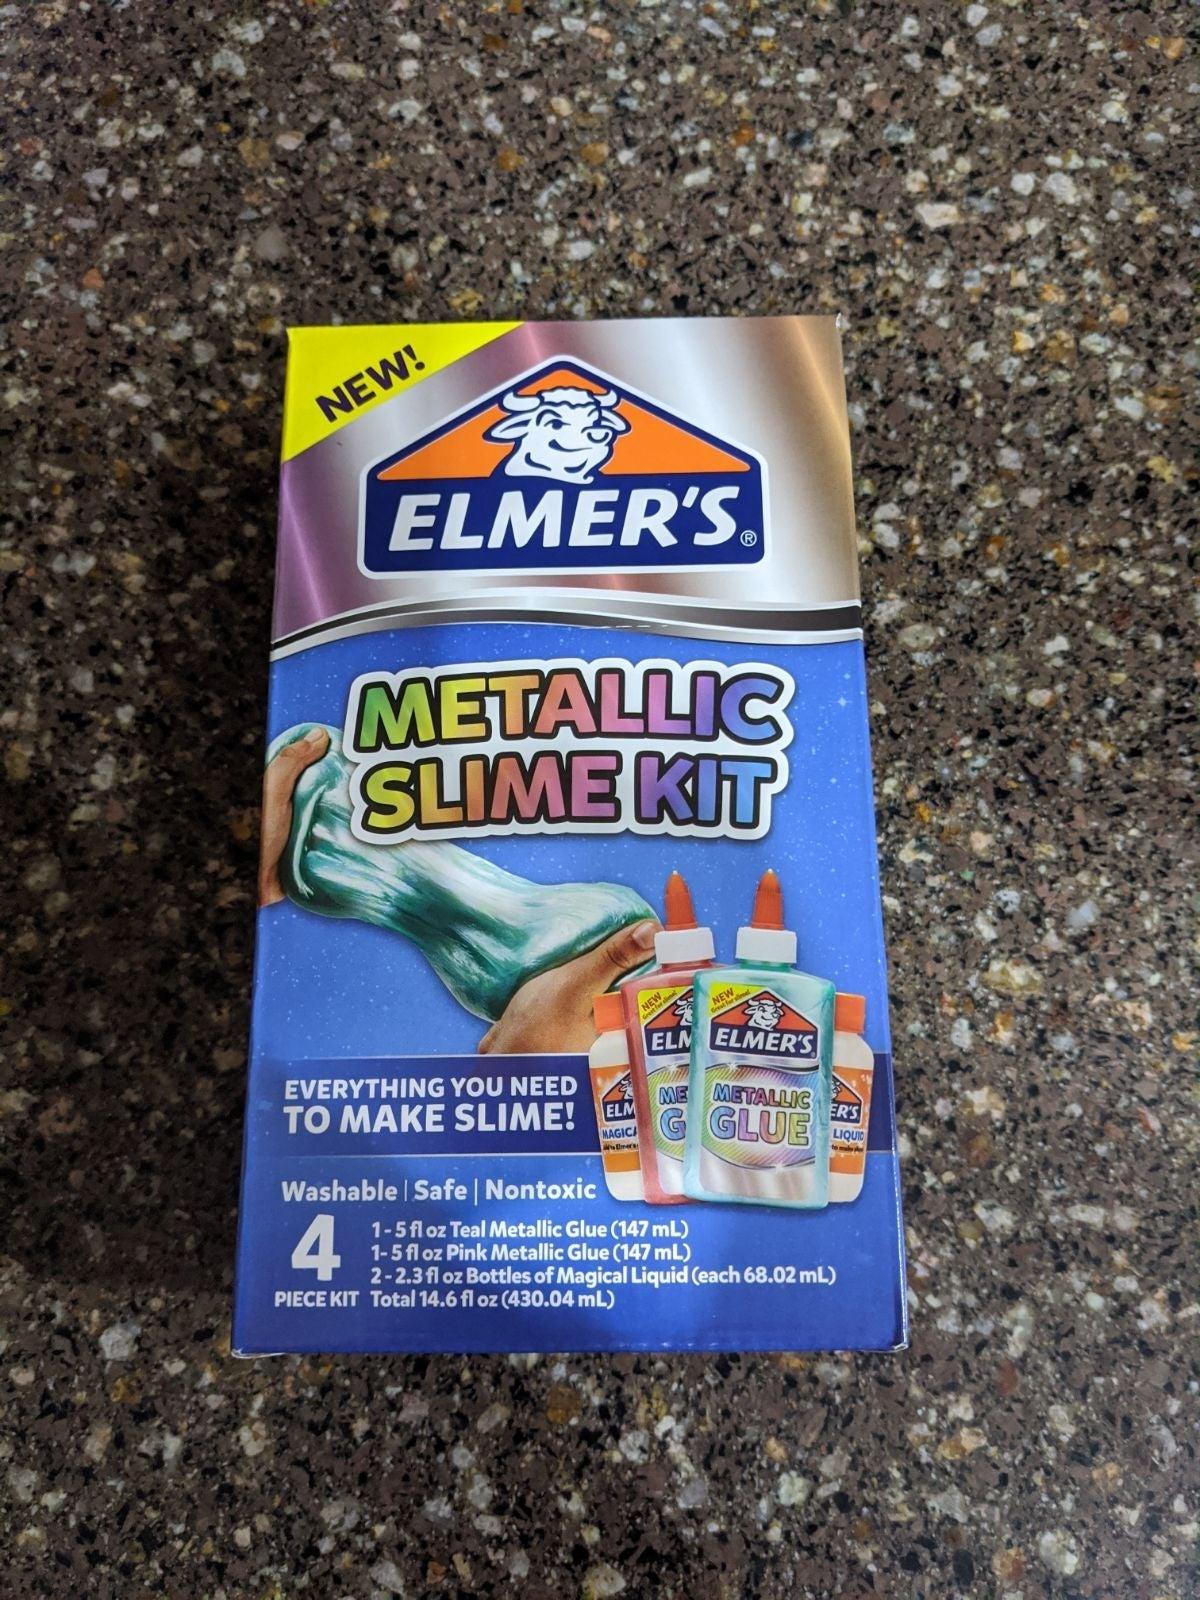 Elmer's Metallic Slime Kit - NWT!